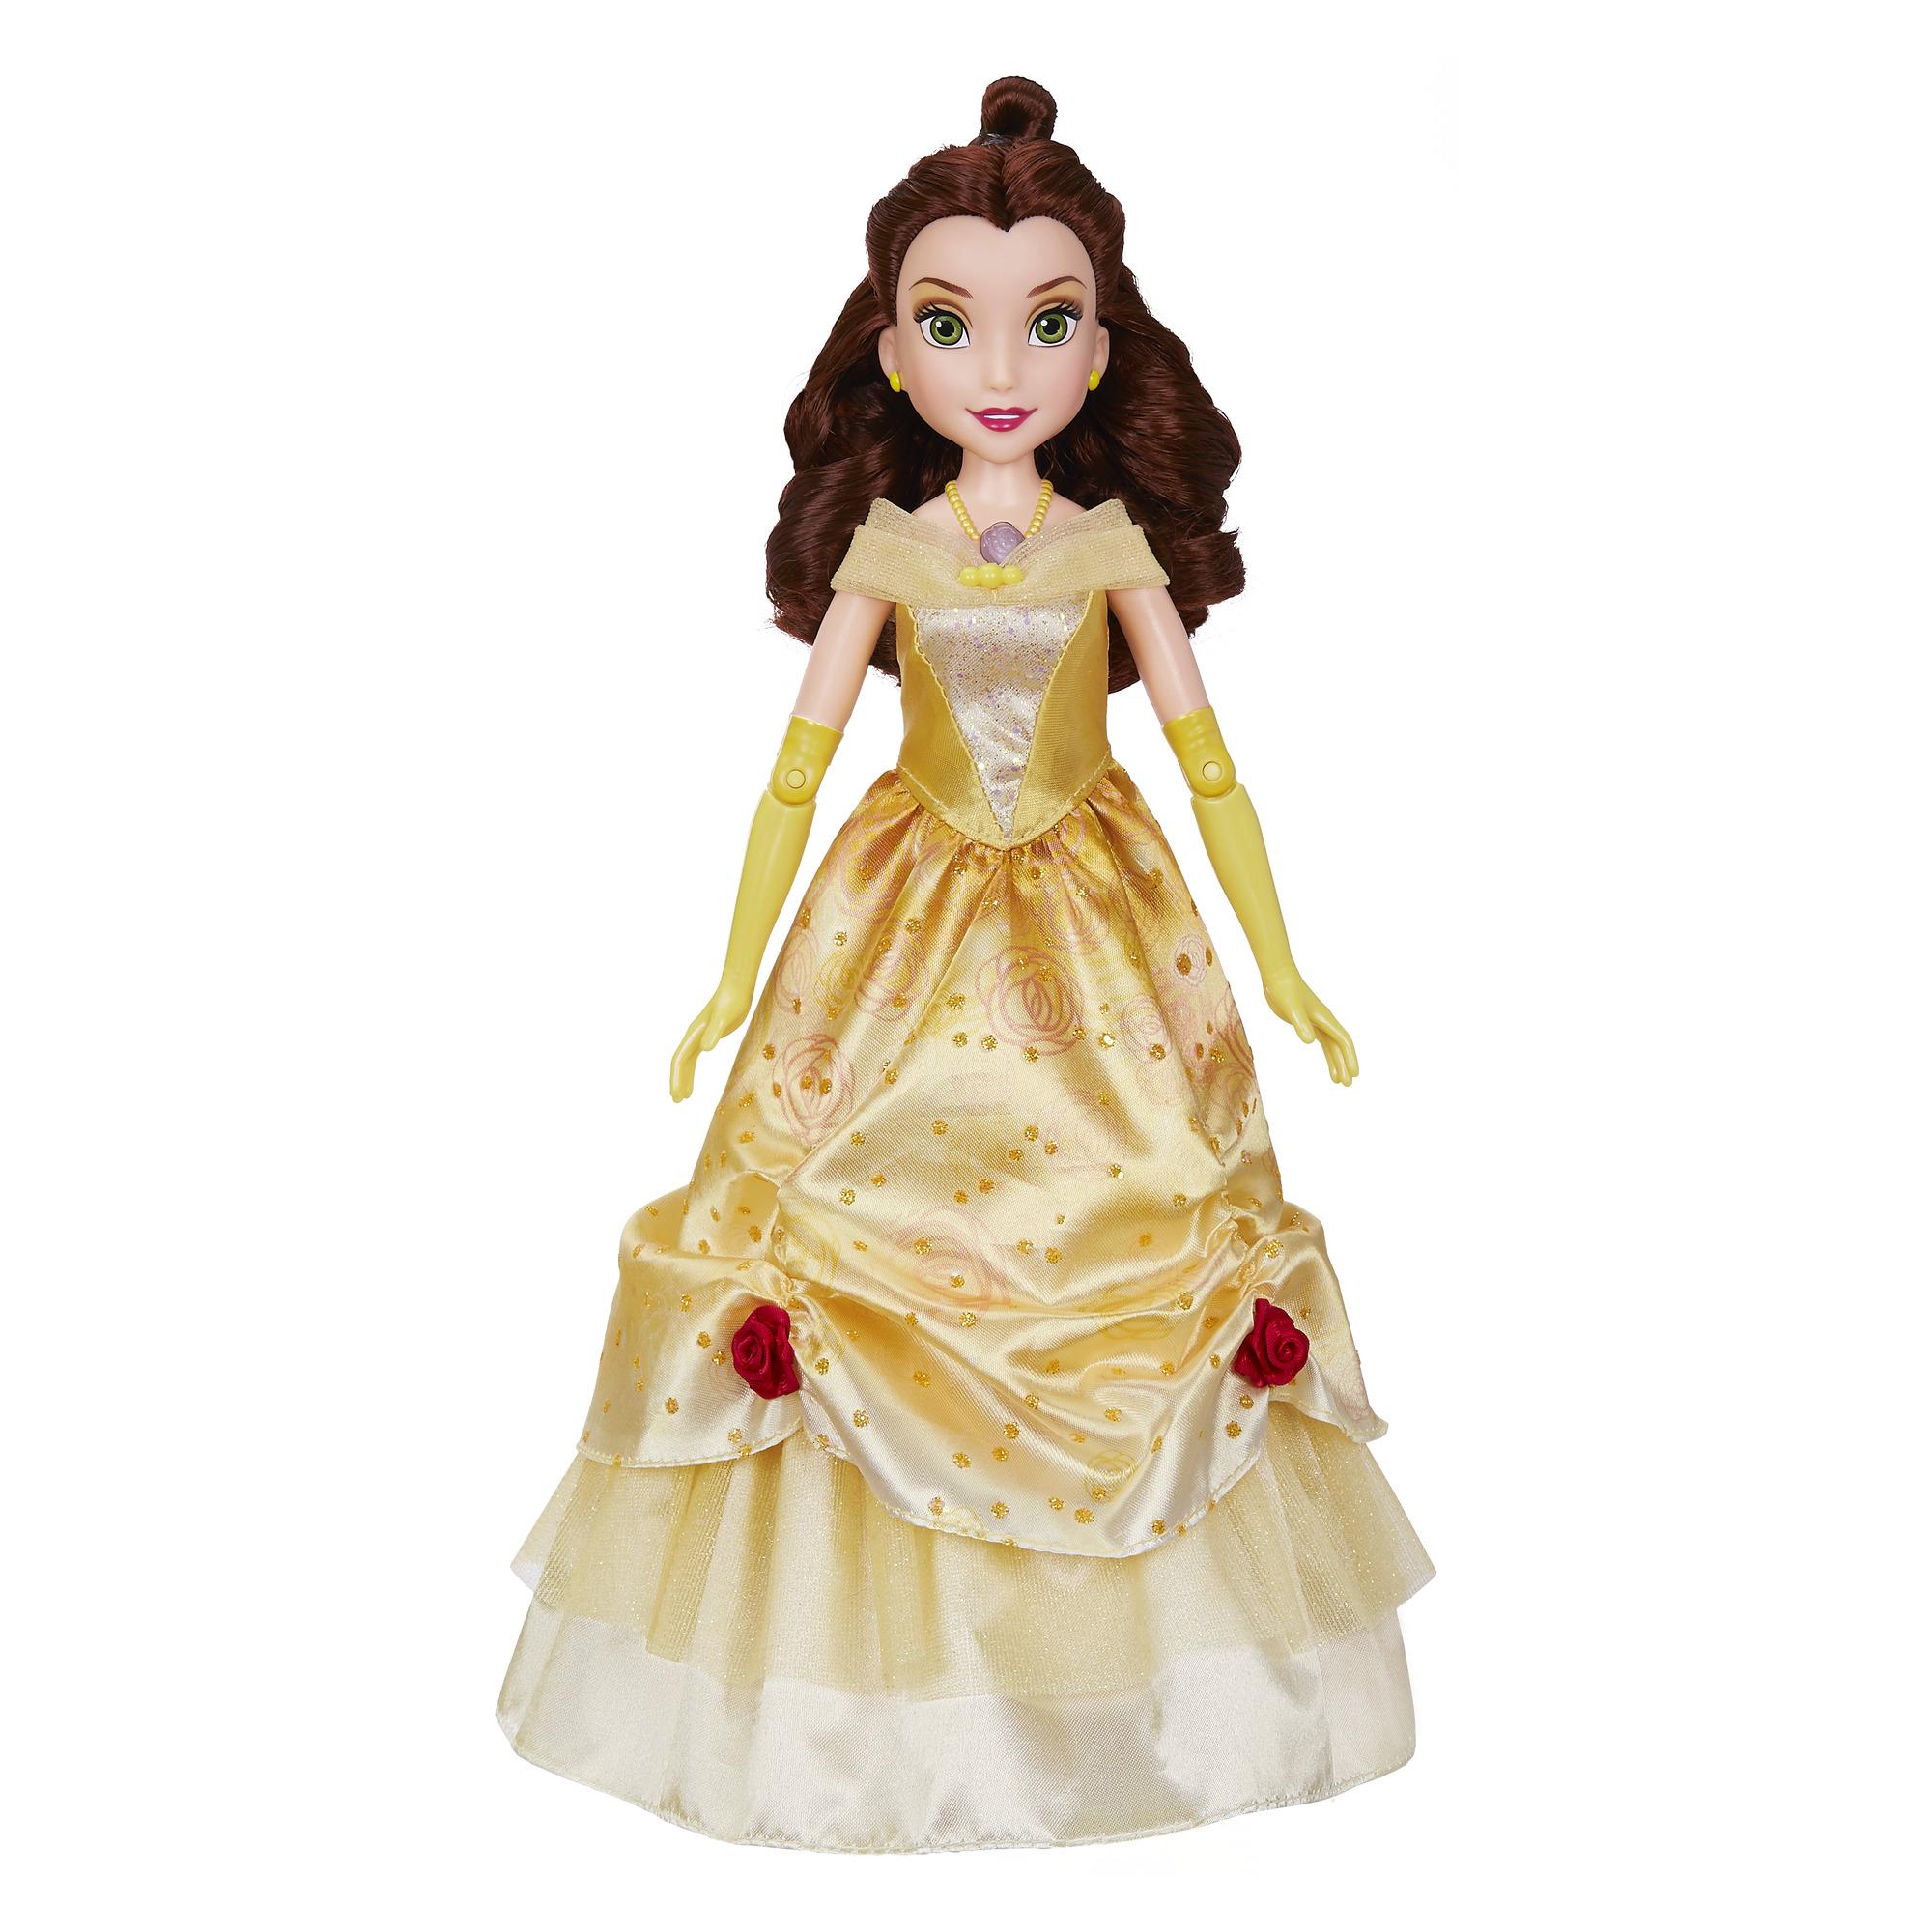 Dance Code featuring Disney Princess Belle